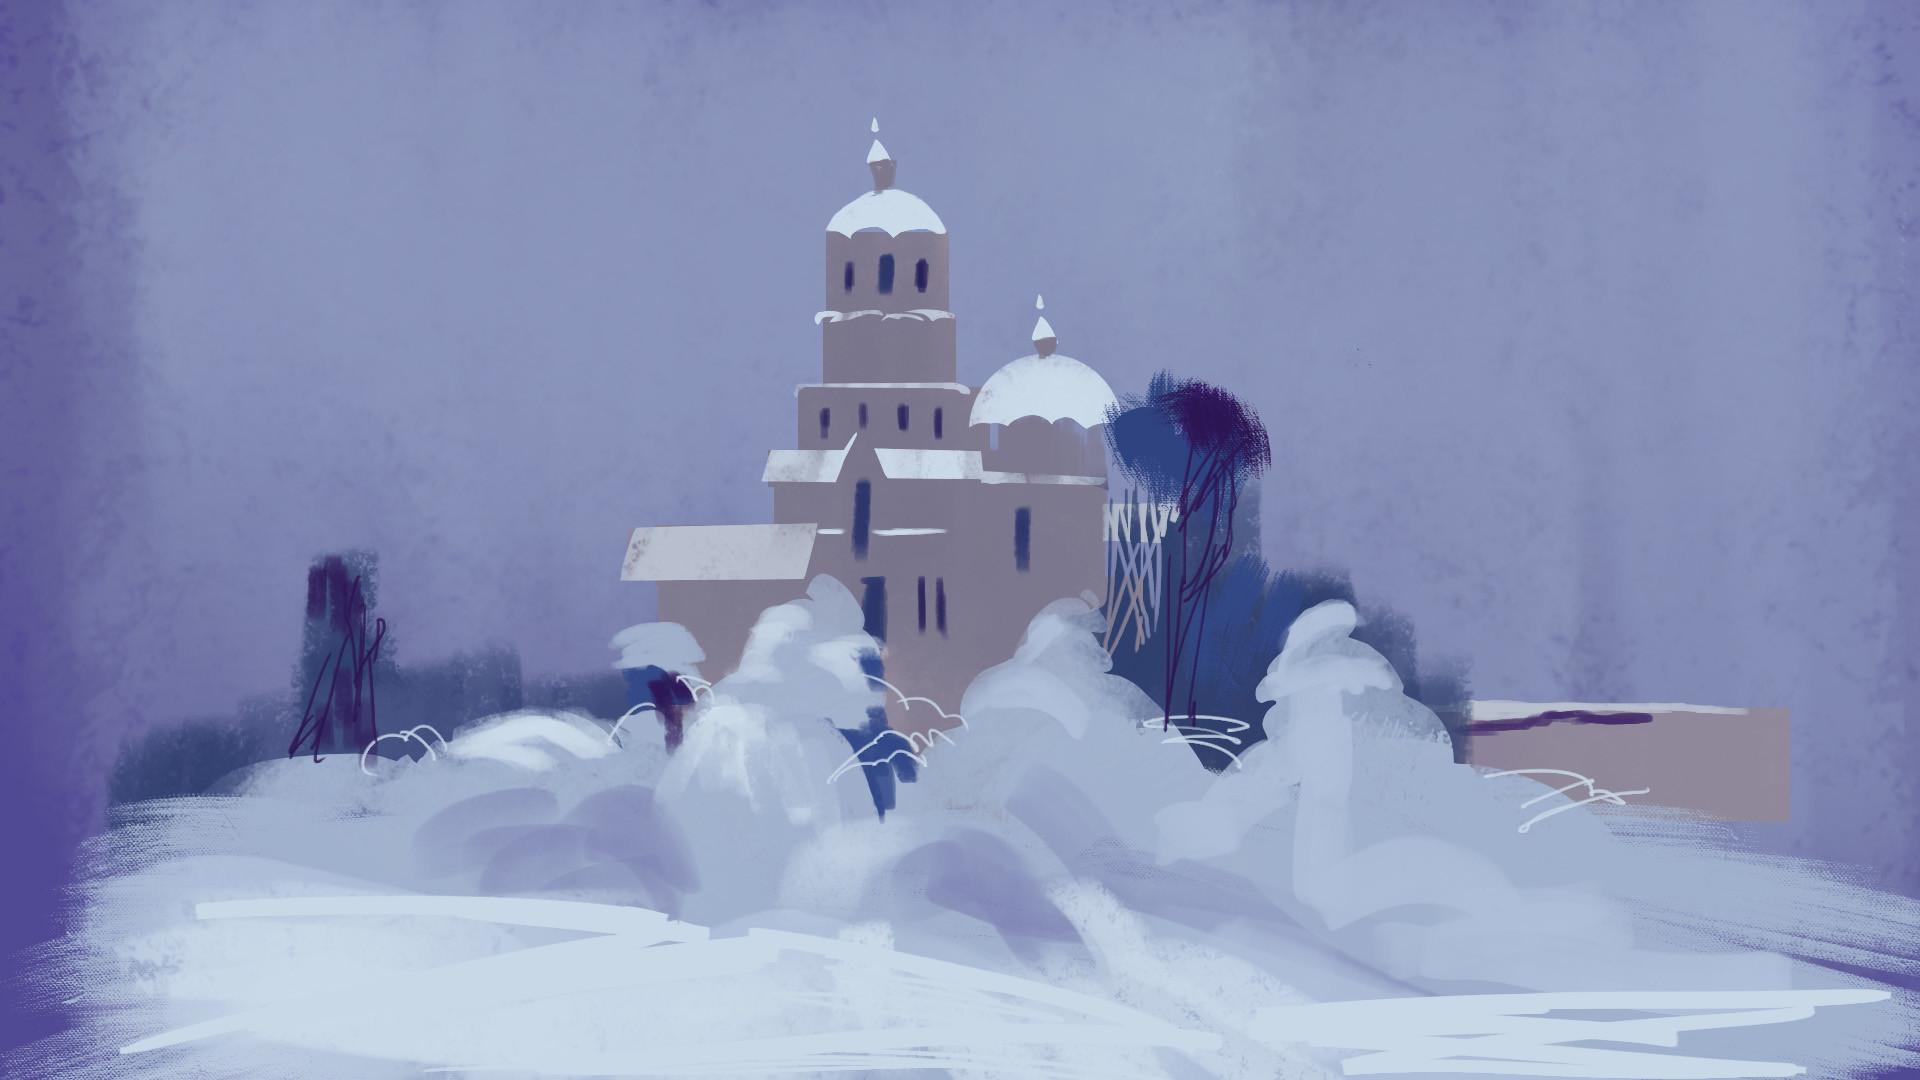 Harrison yinfaowei stepan kolesnikov church in snow